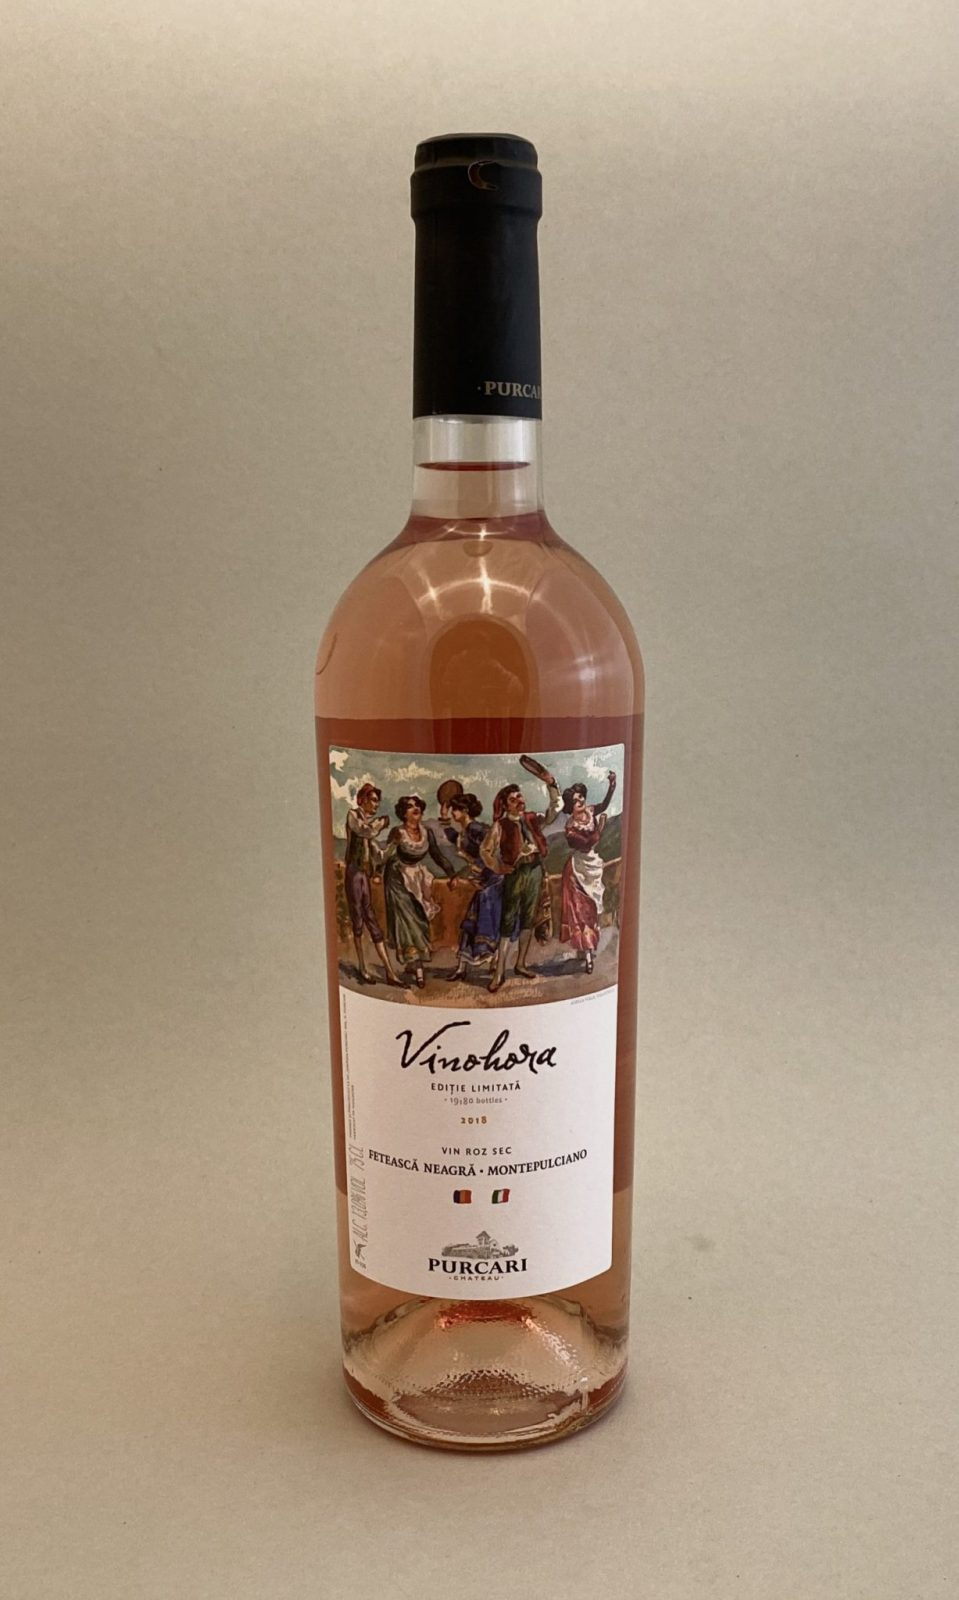 Chateau PURCARI Vinohora Rose 2016, vinoteka Sunny wines slnecnice mesto, Bratislava petrzalka, vino ružové z Moldavska